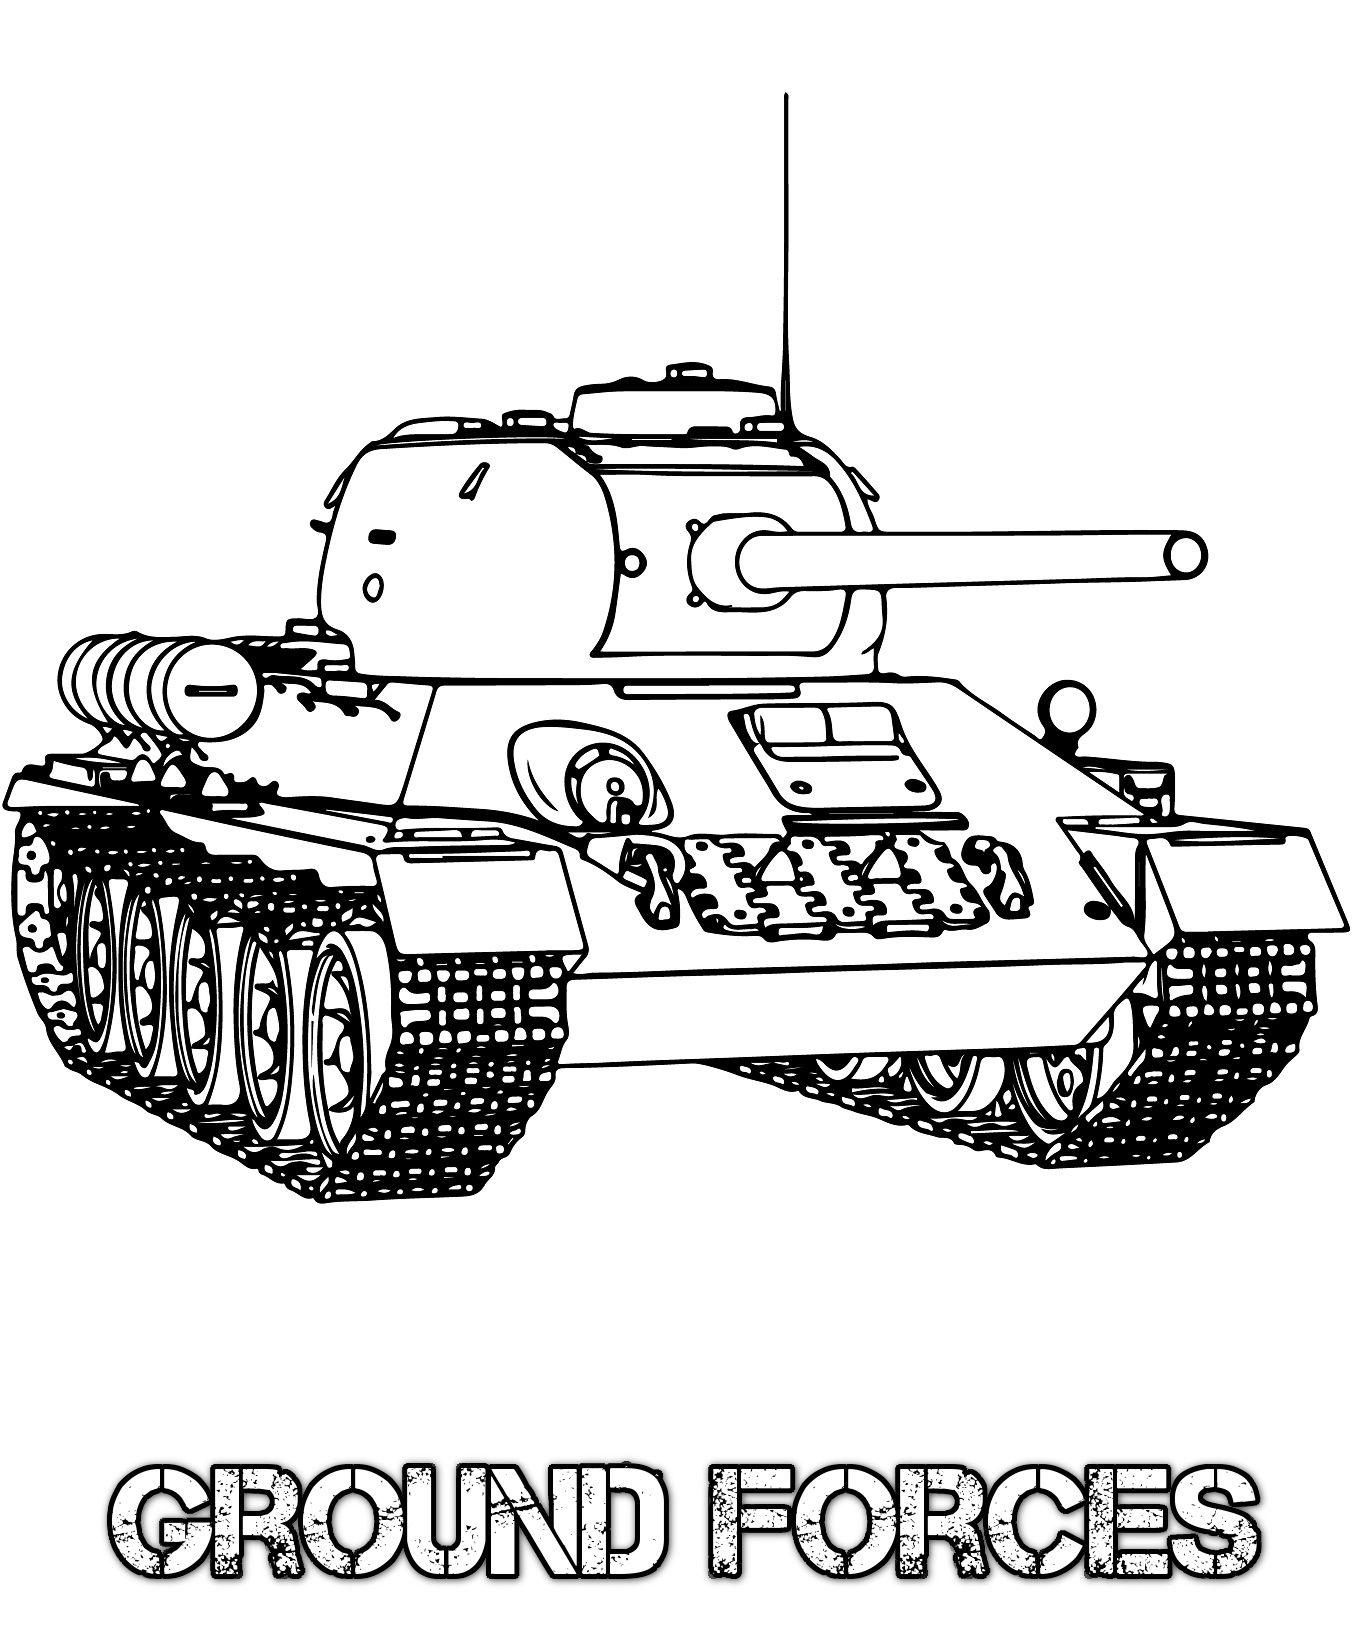 Tanks Coloring Pages : tanks, coloring, pages, Military, Coloring, Pages, Books,, Pages,, Tanks